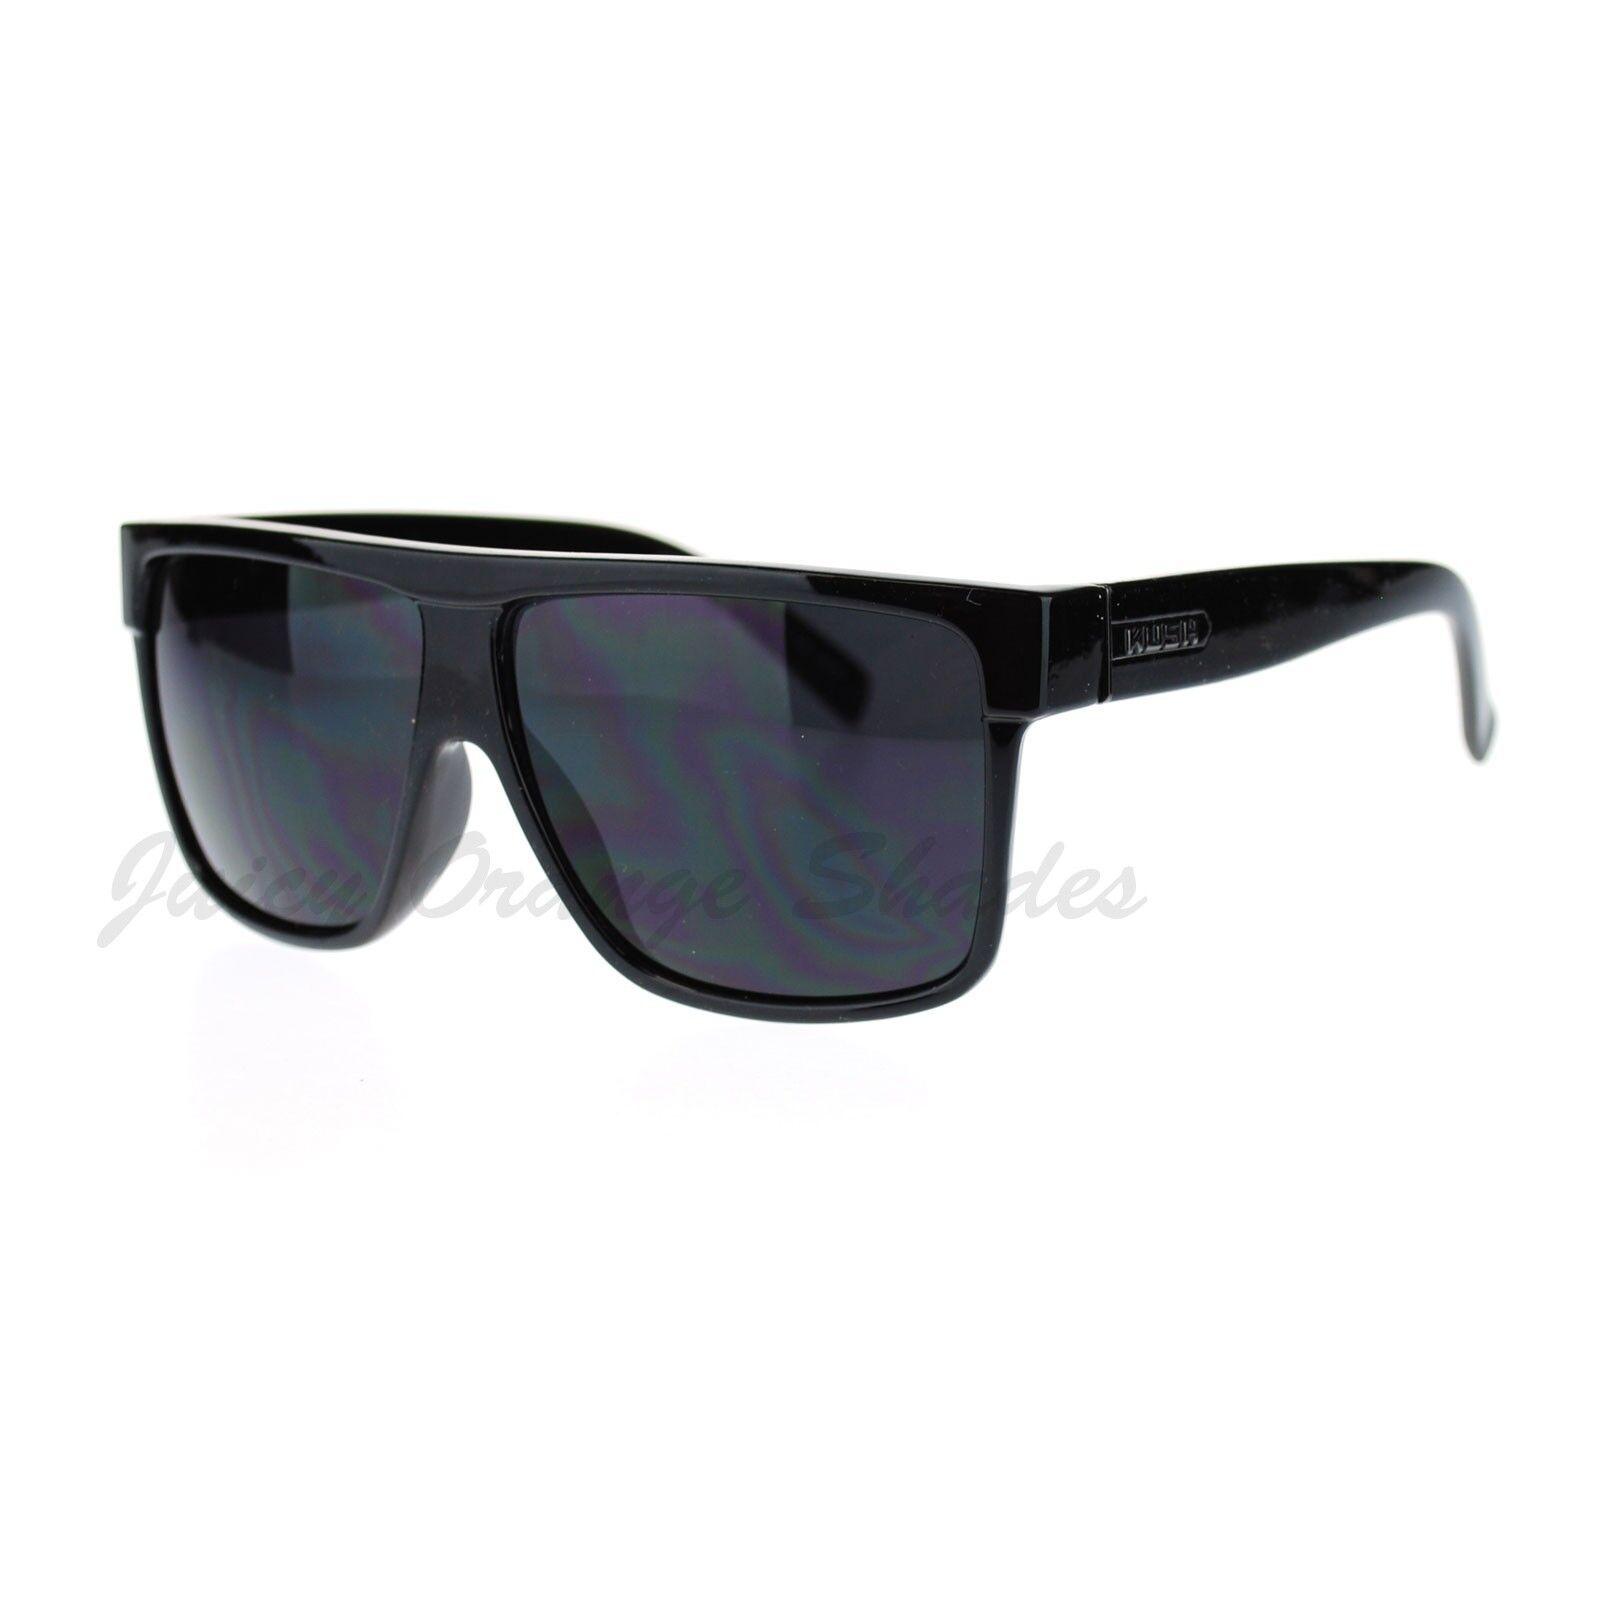 KUSH Men/'s Sunglasses Flat Top Square Frame Black Dark Lens